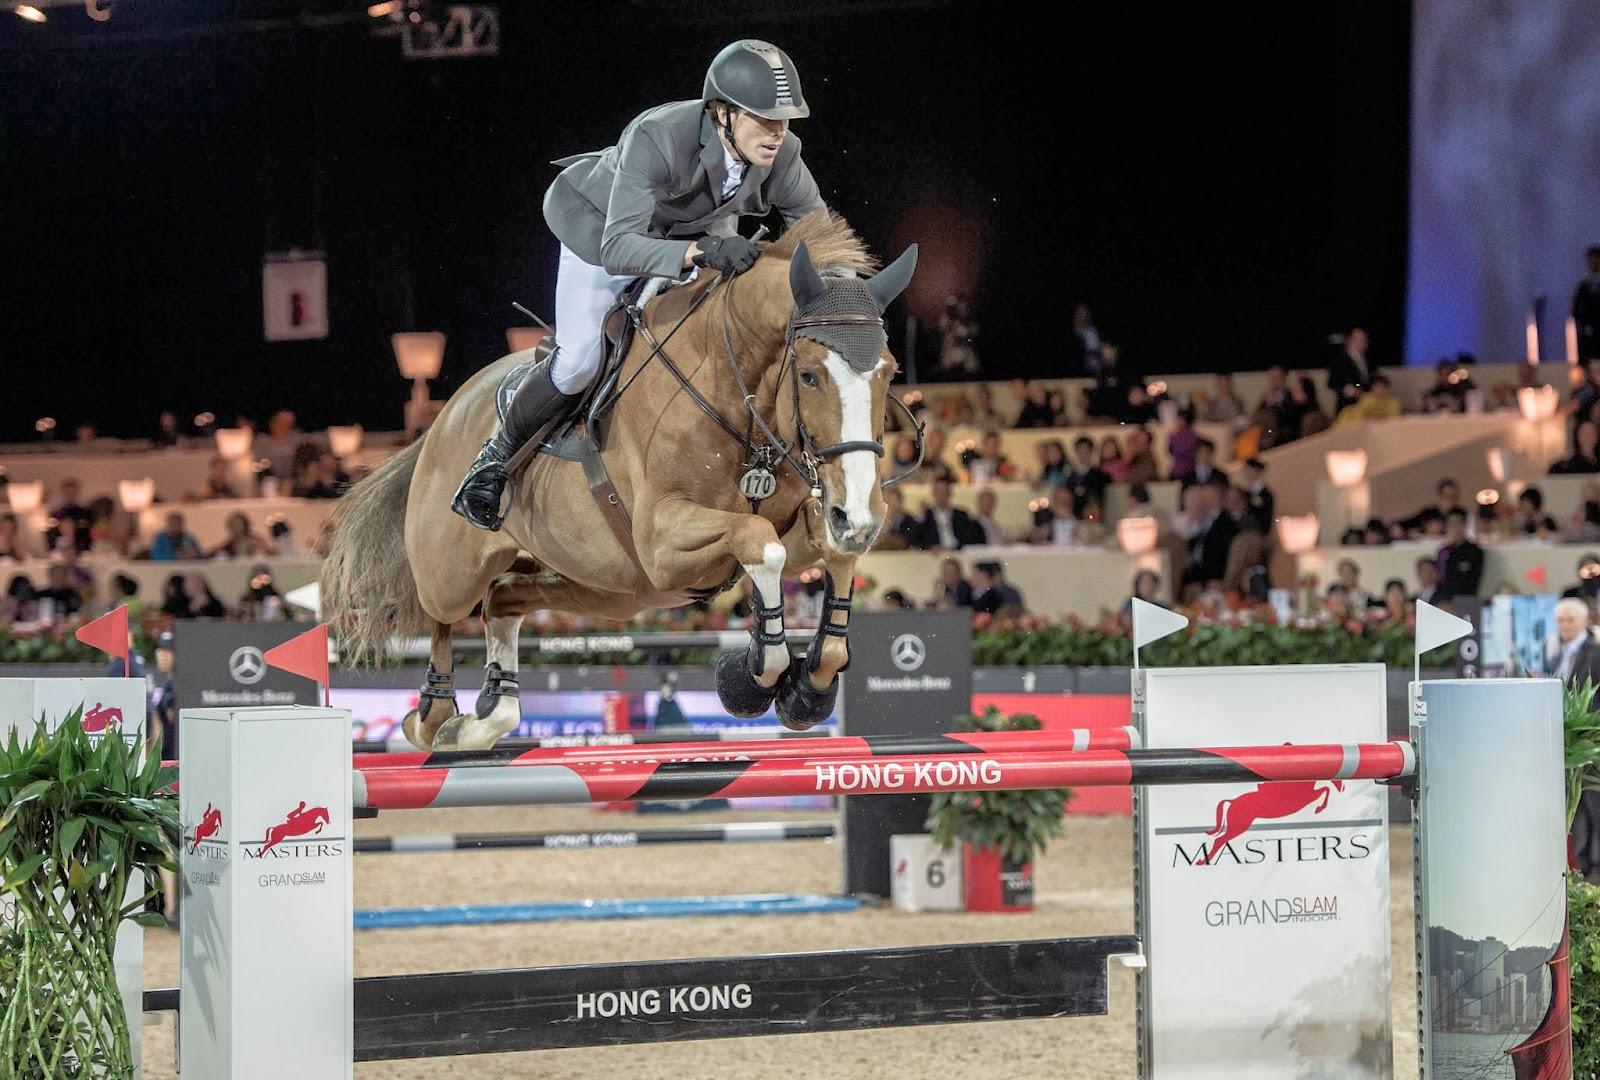 Carinjo HDC, Competition, Germany, Gotha FRH 18, Hong Kong Masters, Horse, Horse Jump, Longines, Longines Grand Prix, Sports, Sweden, Ukraine, Winner,